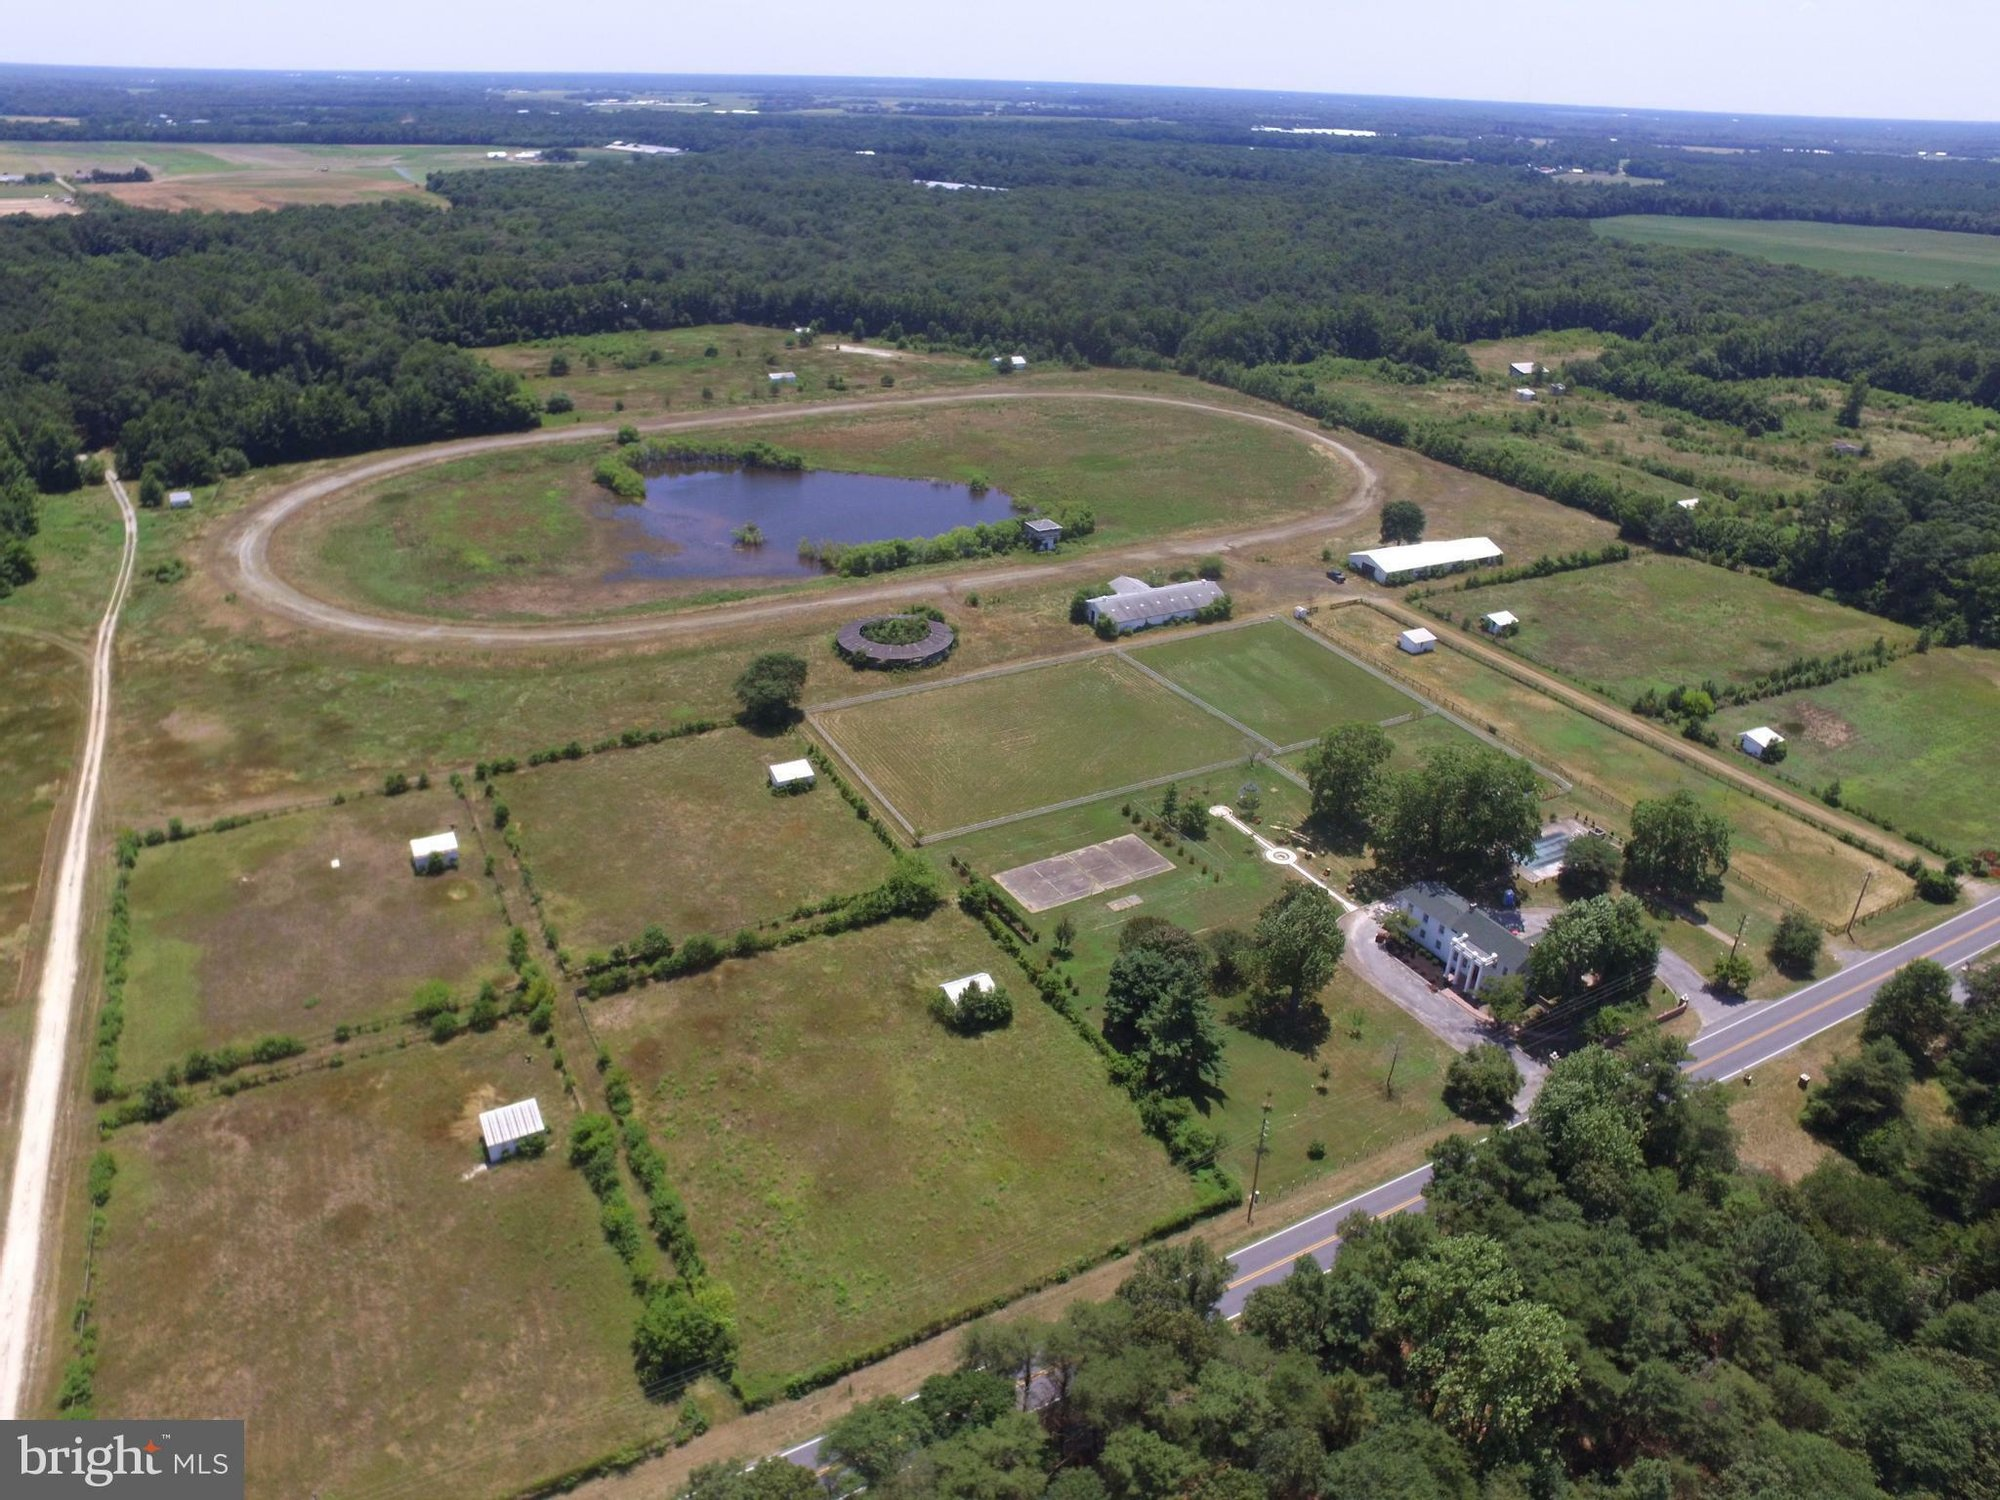 Farm Ranch in Seaford, Delaware, United States 1